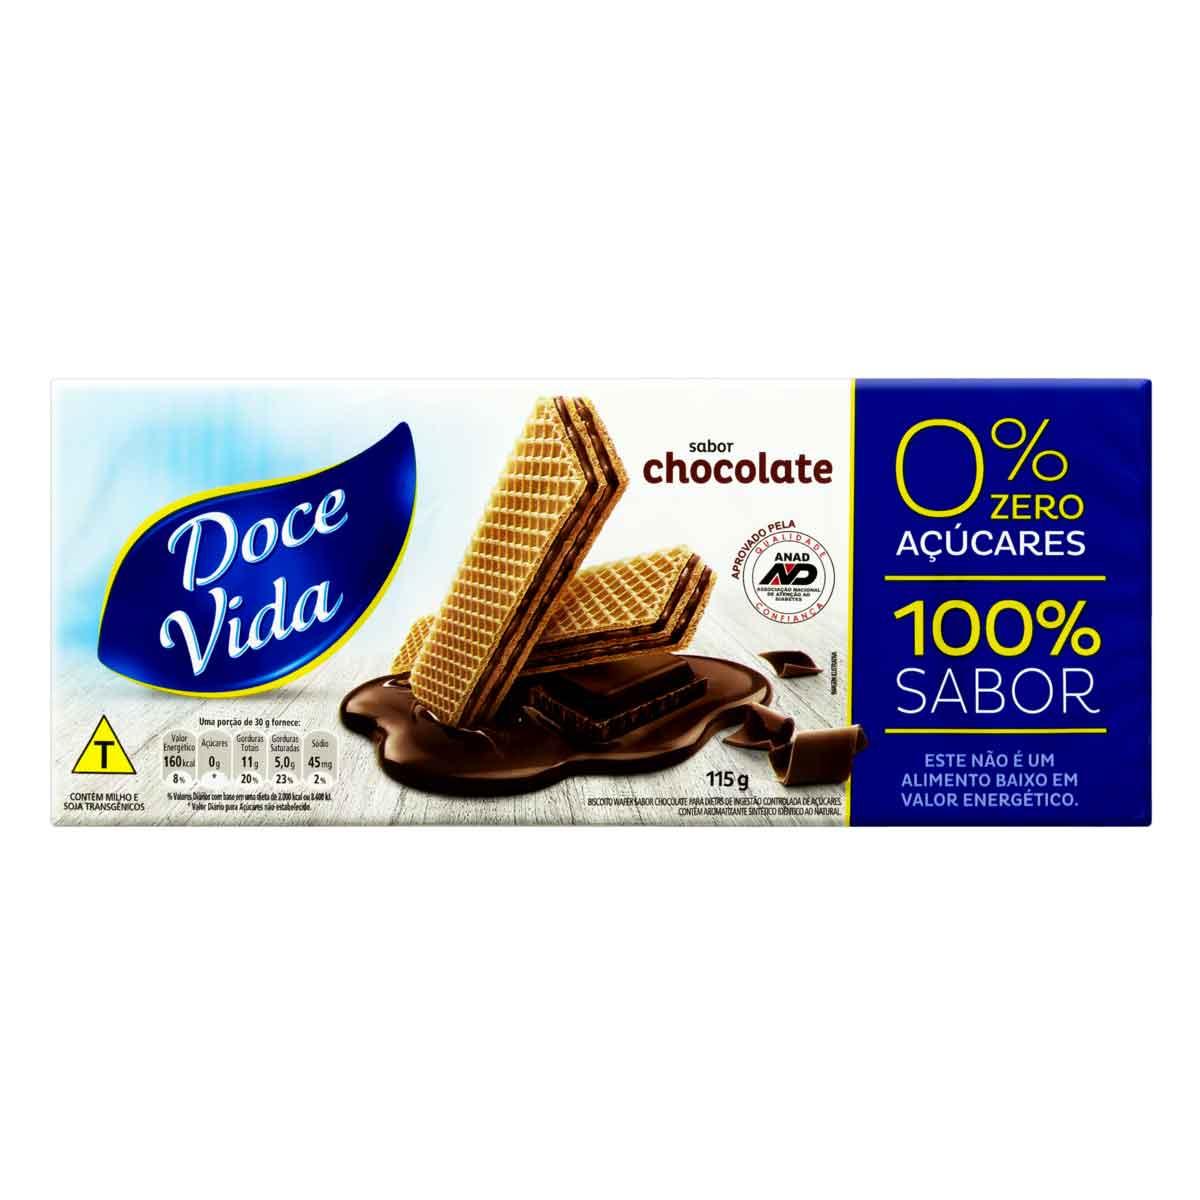 WAFER BISCOITO DOCE VIDA CHO 1X115G (30)